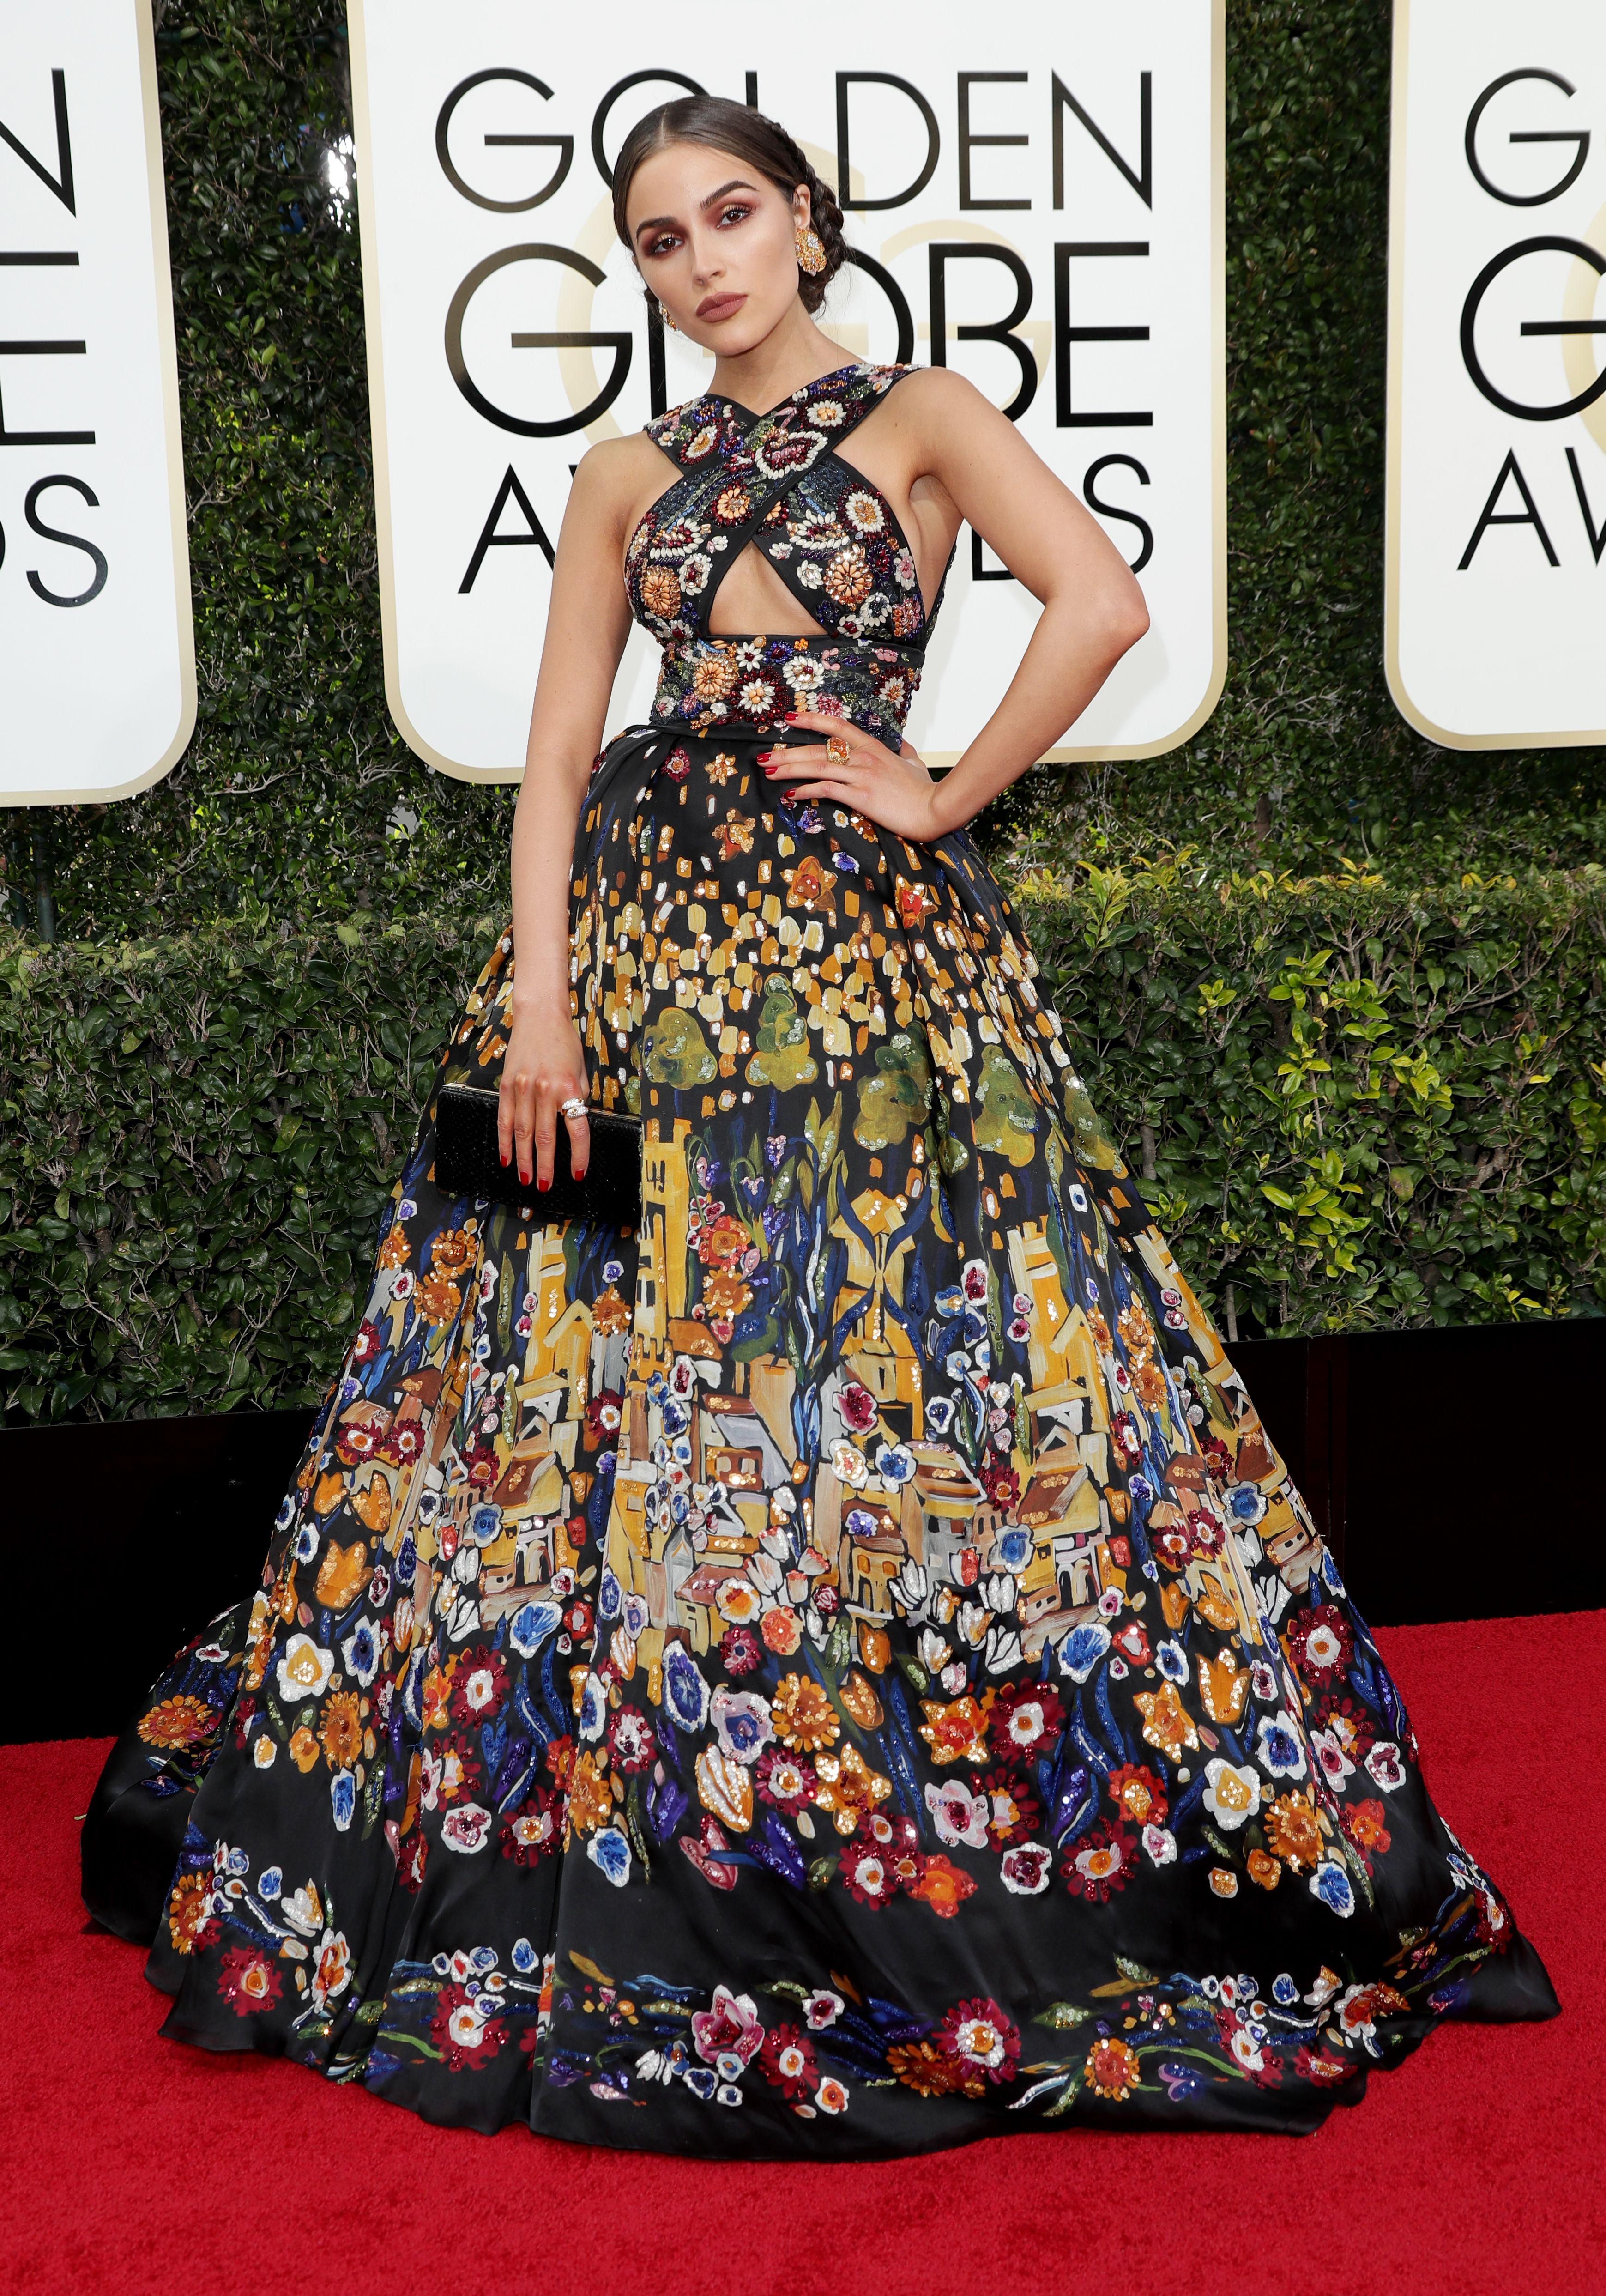 Olivia Culpo, Golden Globes. Mandatory Credit: Photo by Jim Smeal/BEI/Shutterstock